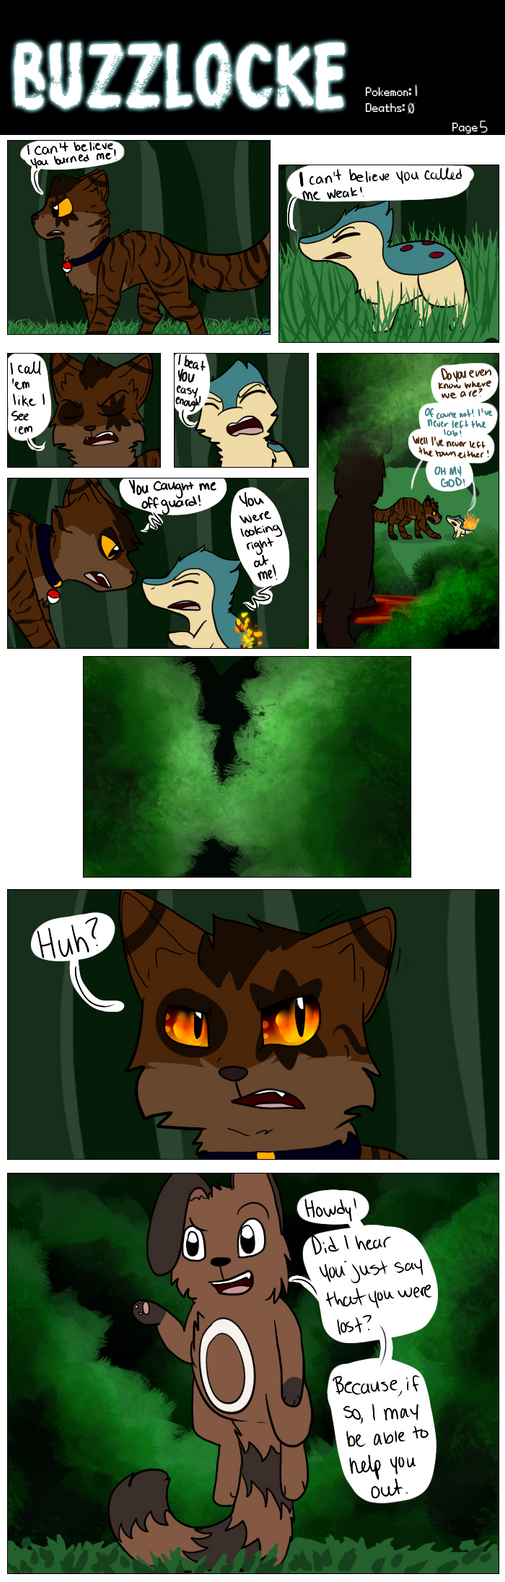 Buzzlocke Page 5 by Spiritpie